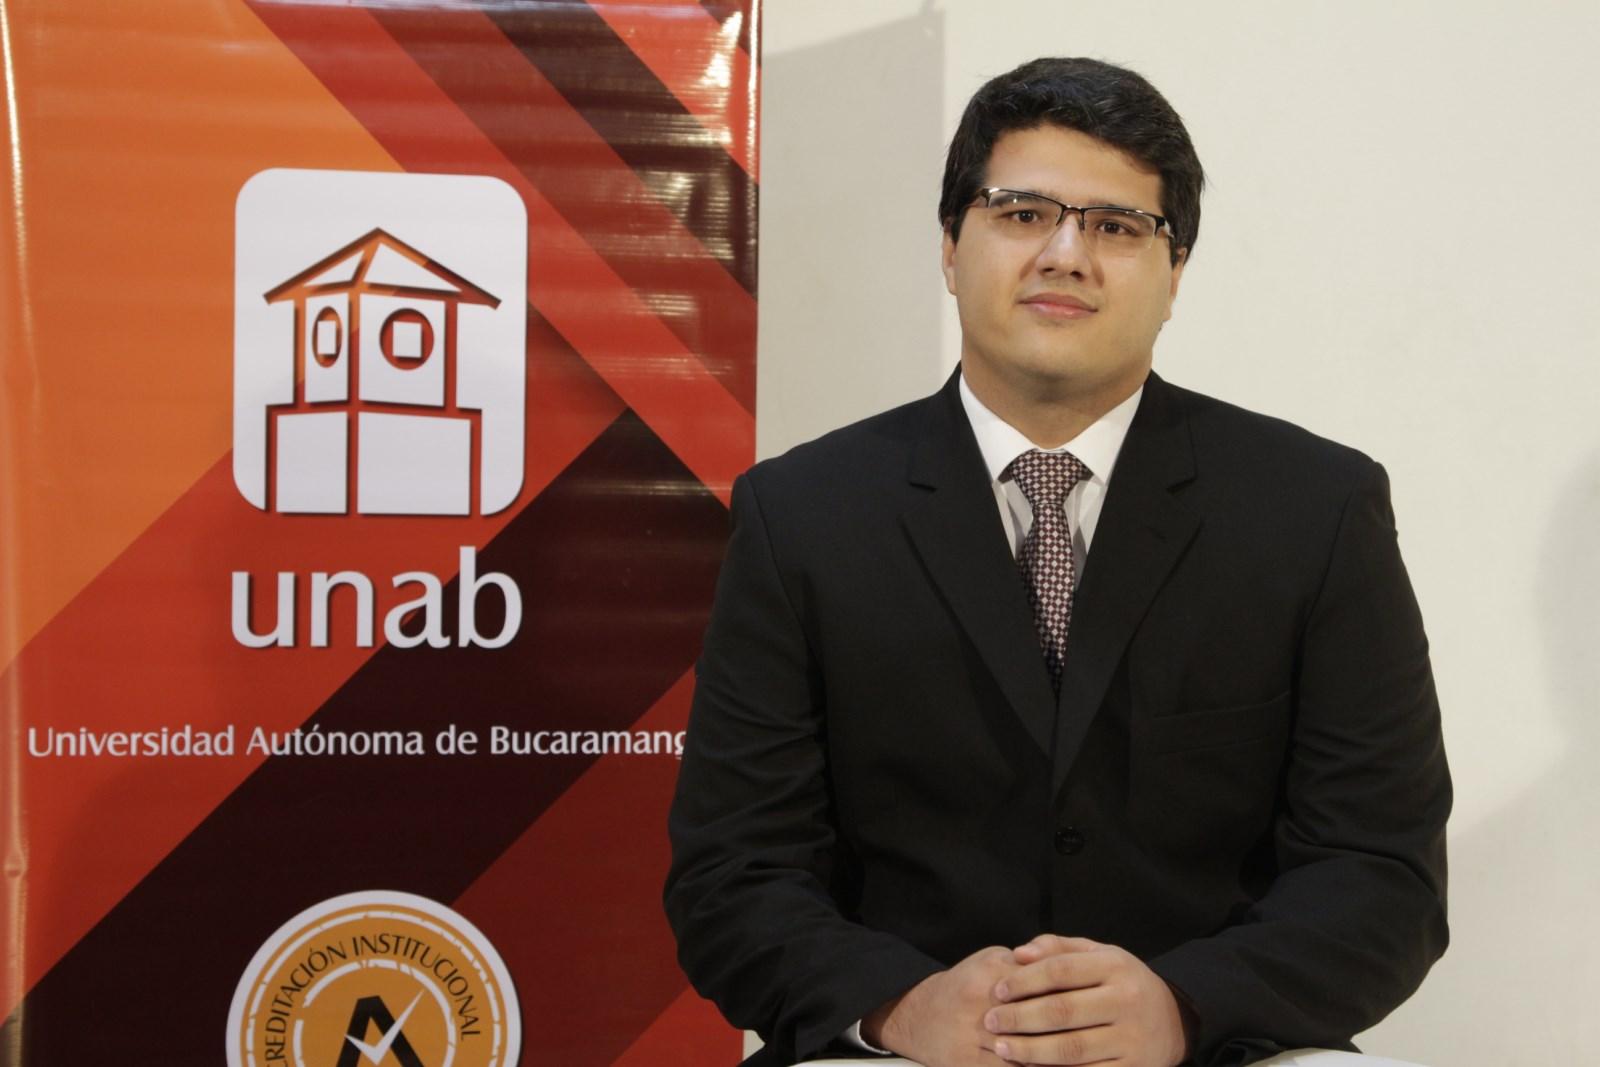 Julian Eduardo Prada Uribe